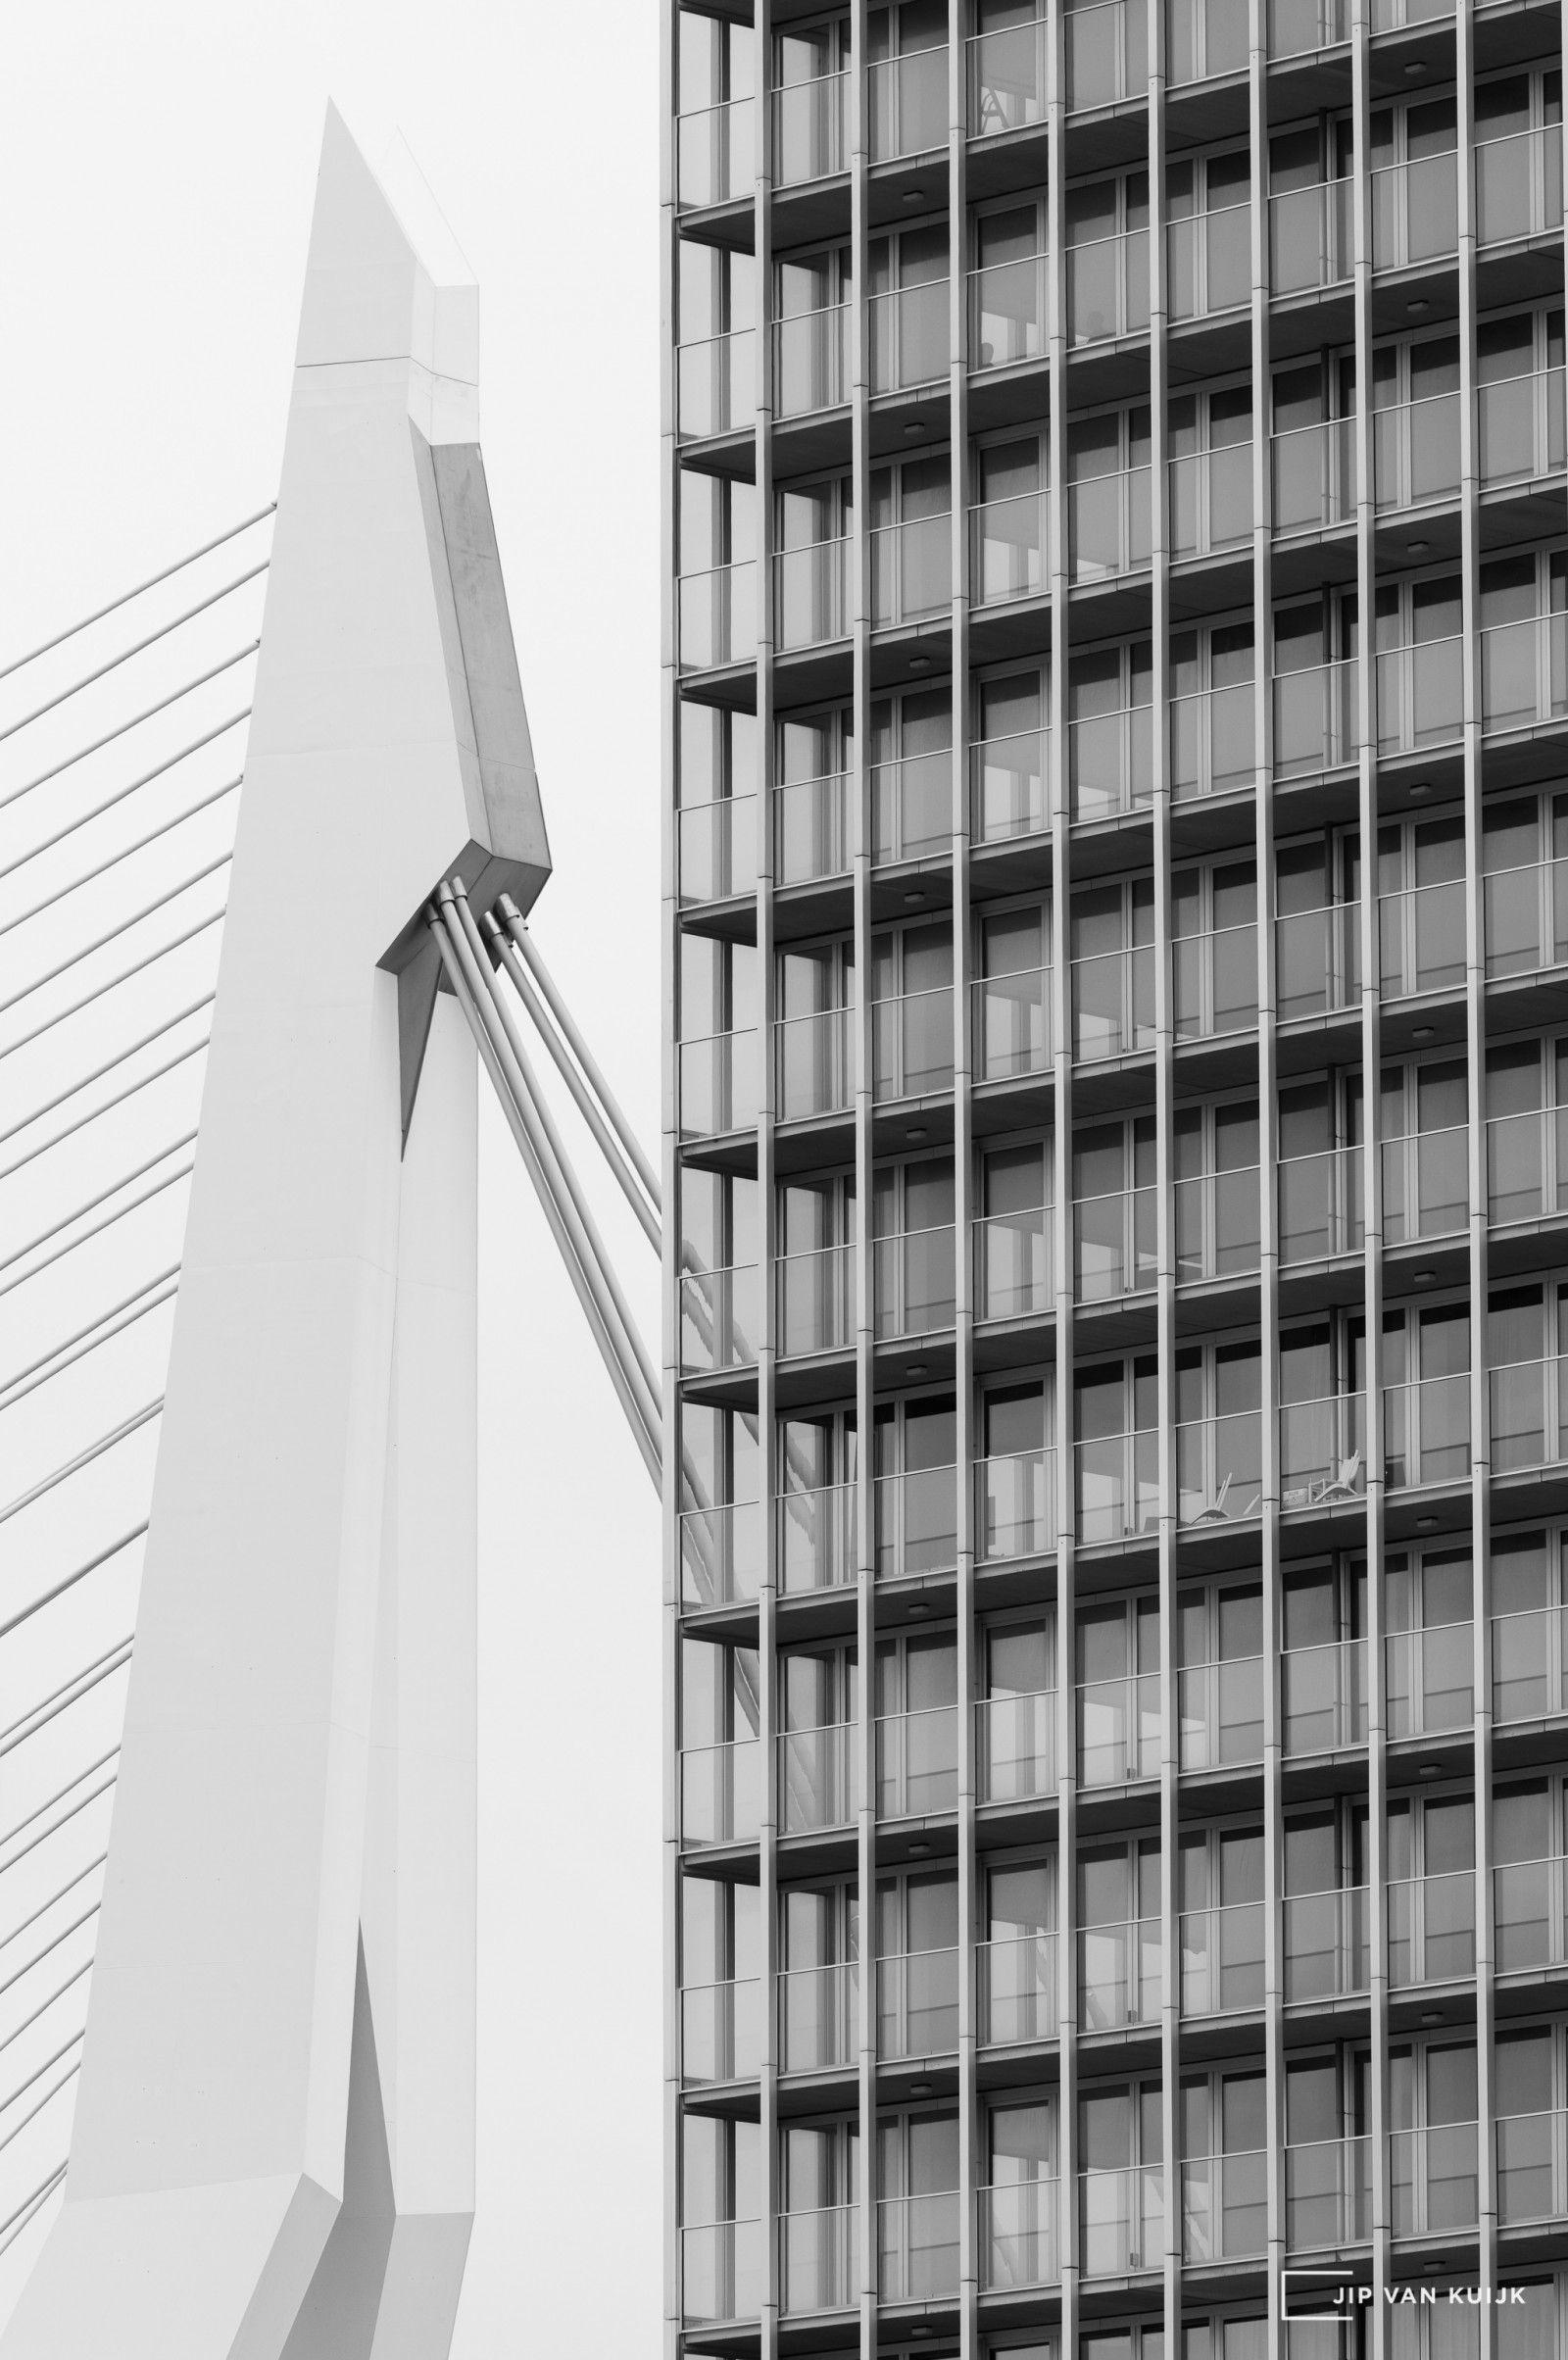 Erasmus_bridge_rotterdam_koolhaas_jipvankuijk_leica_hasselblad_300mm_HC_copyright_new